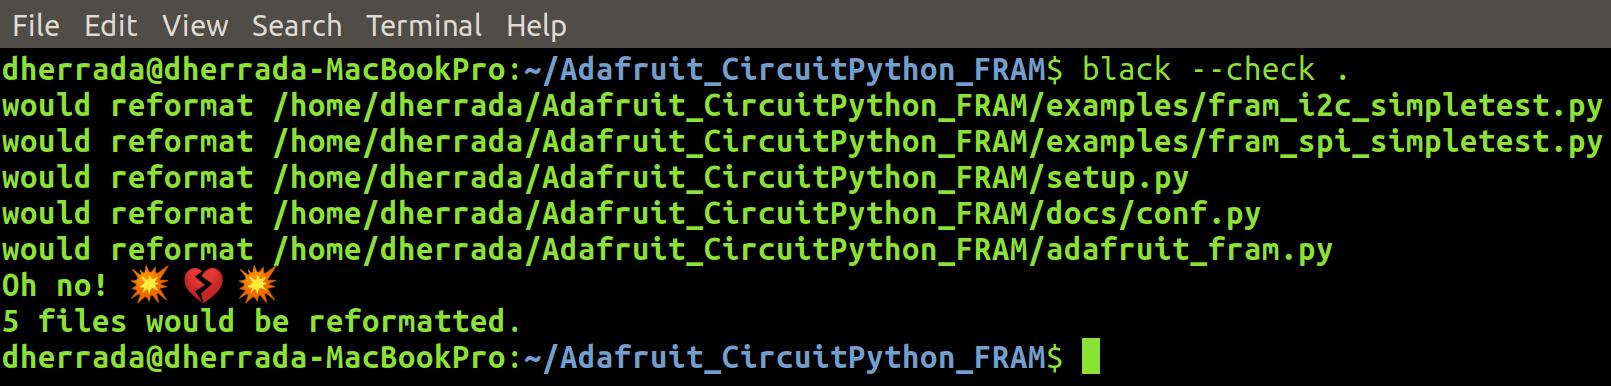 circuitpython_black_--check.png